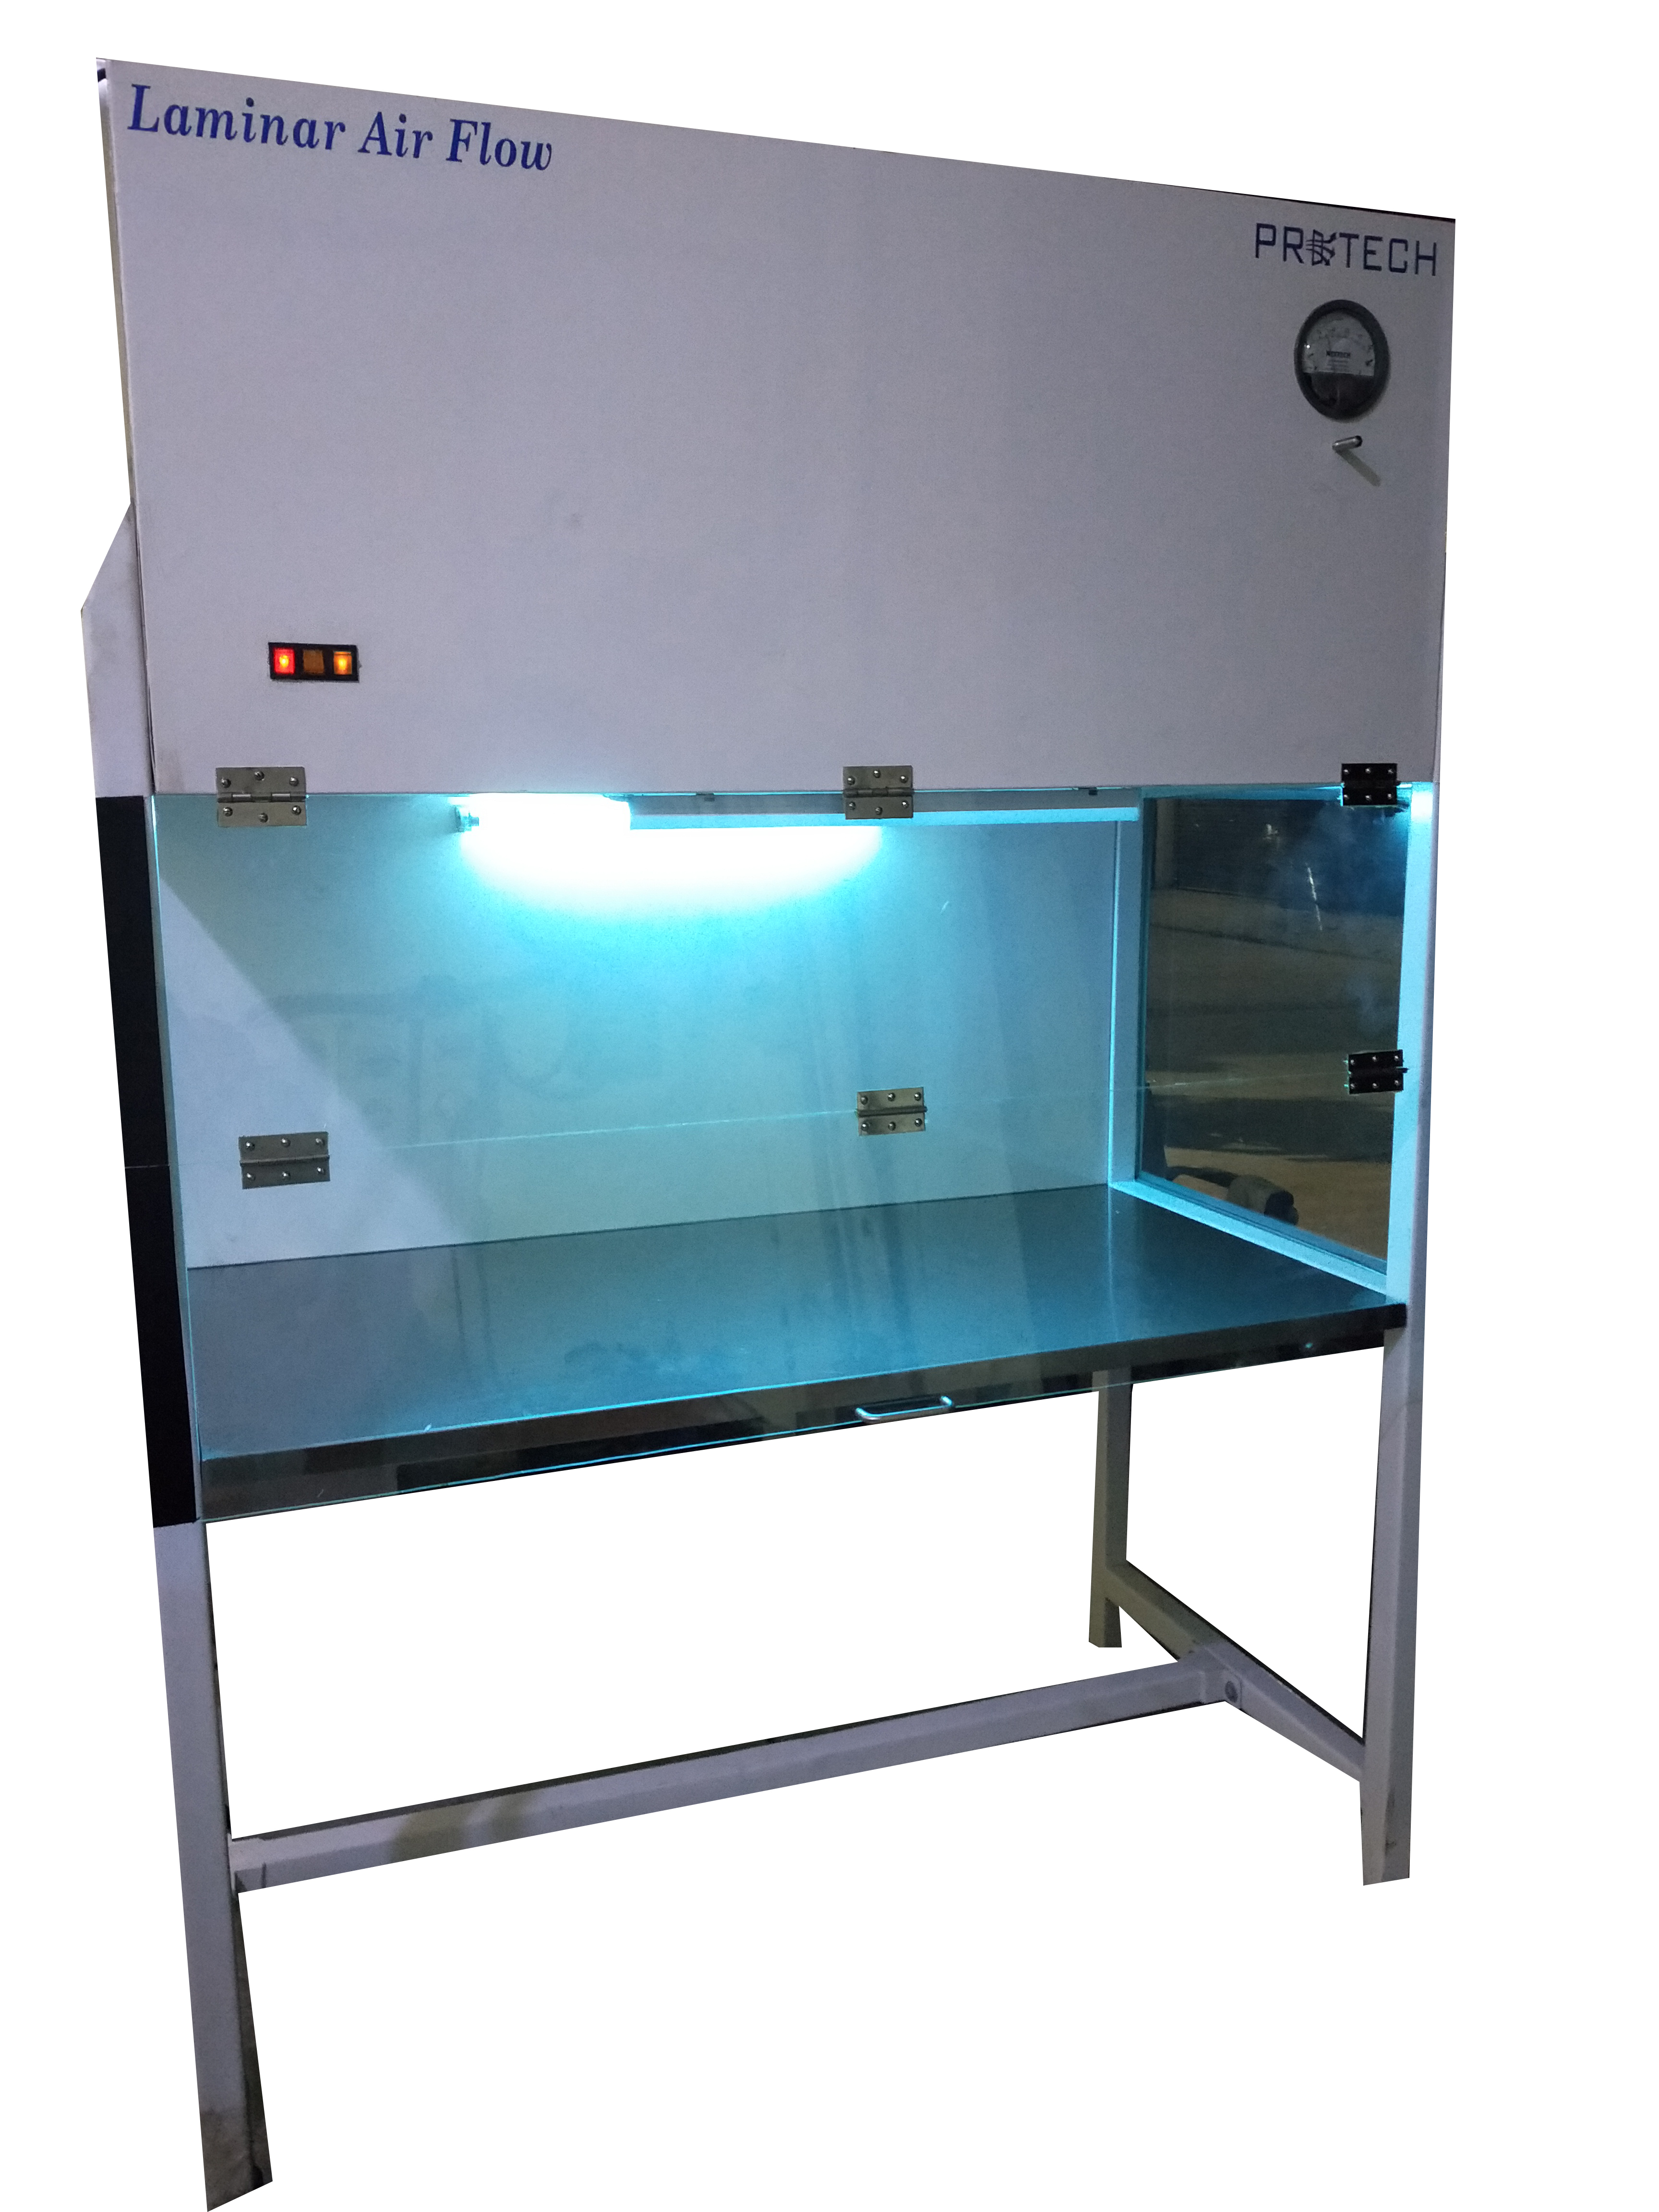 TABLE TOP LAMINAR AIR FLOW BENCH